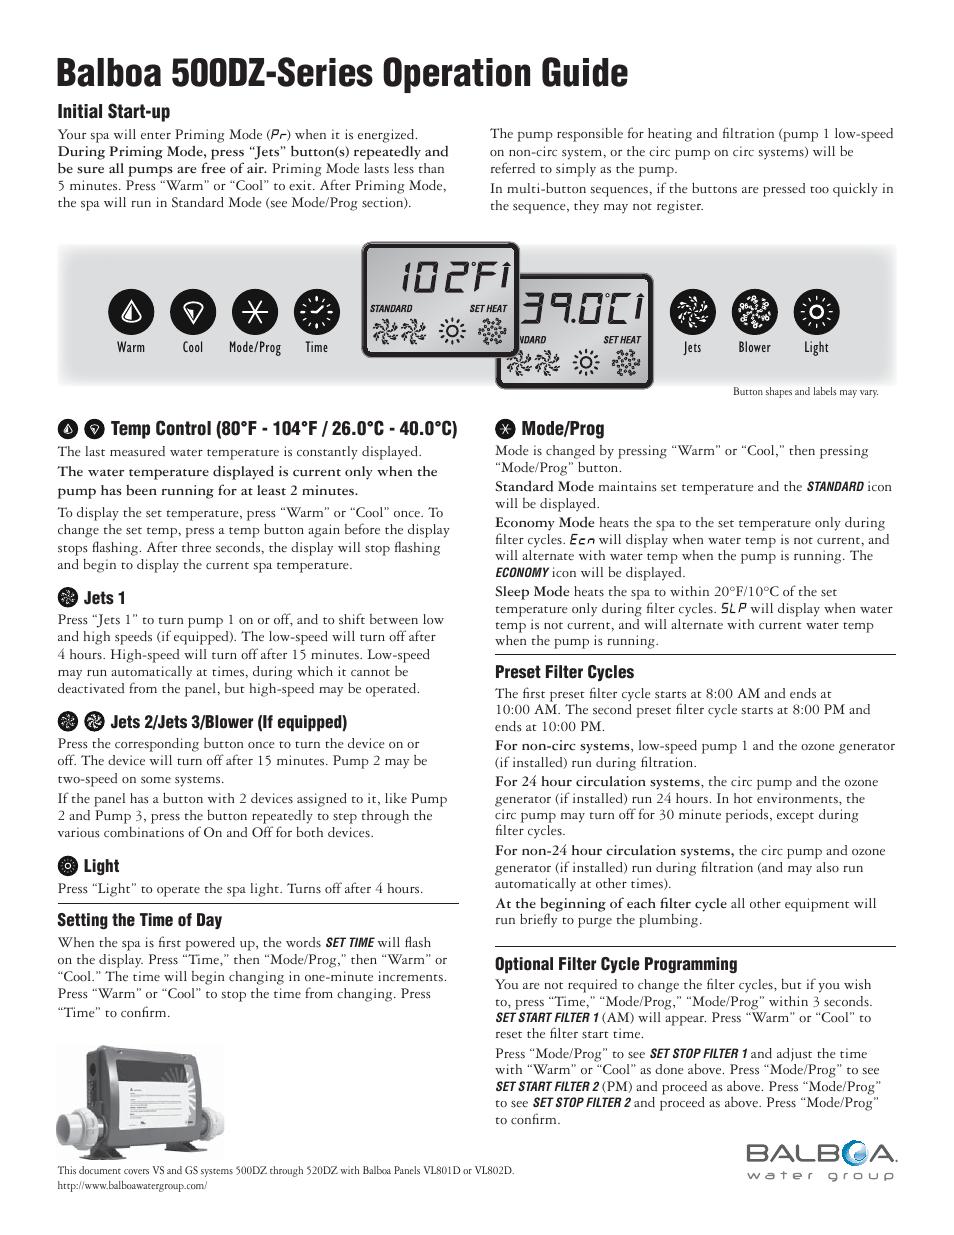 balboa temperature control manual on